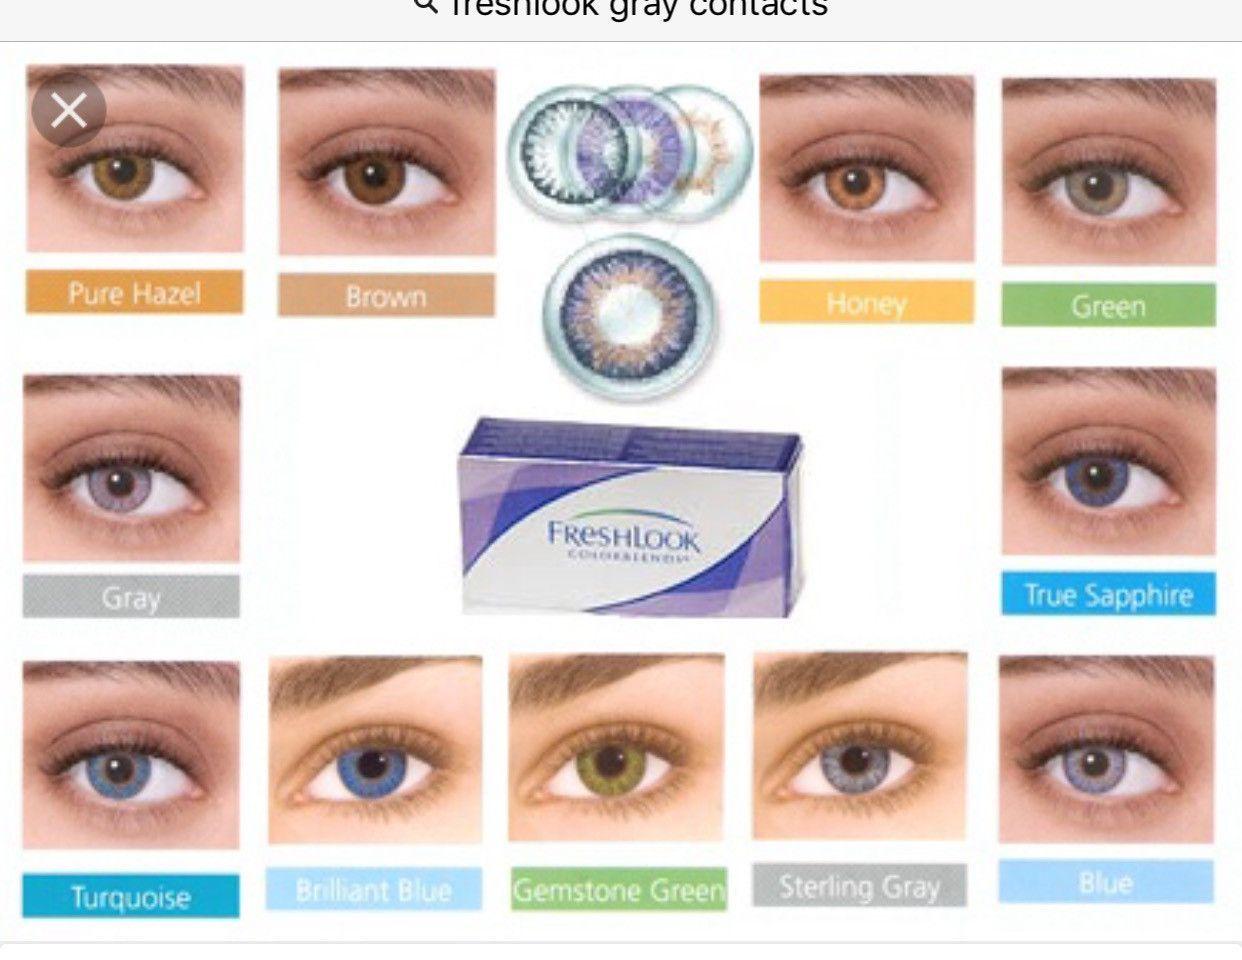 Color contacts prescription colored contacts color contacts and color contacts nvjuhfo Image collections